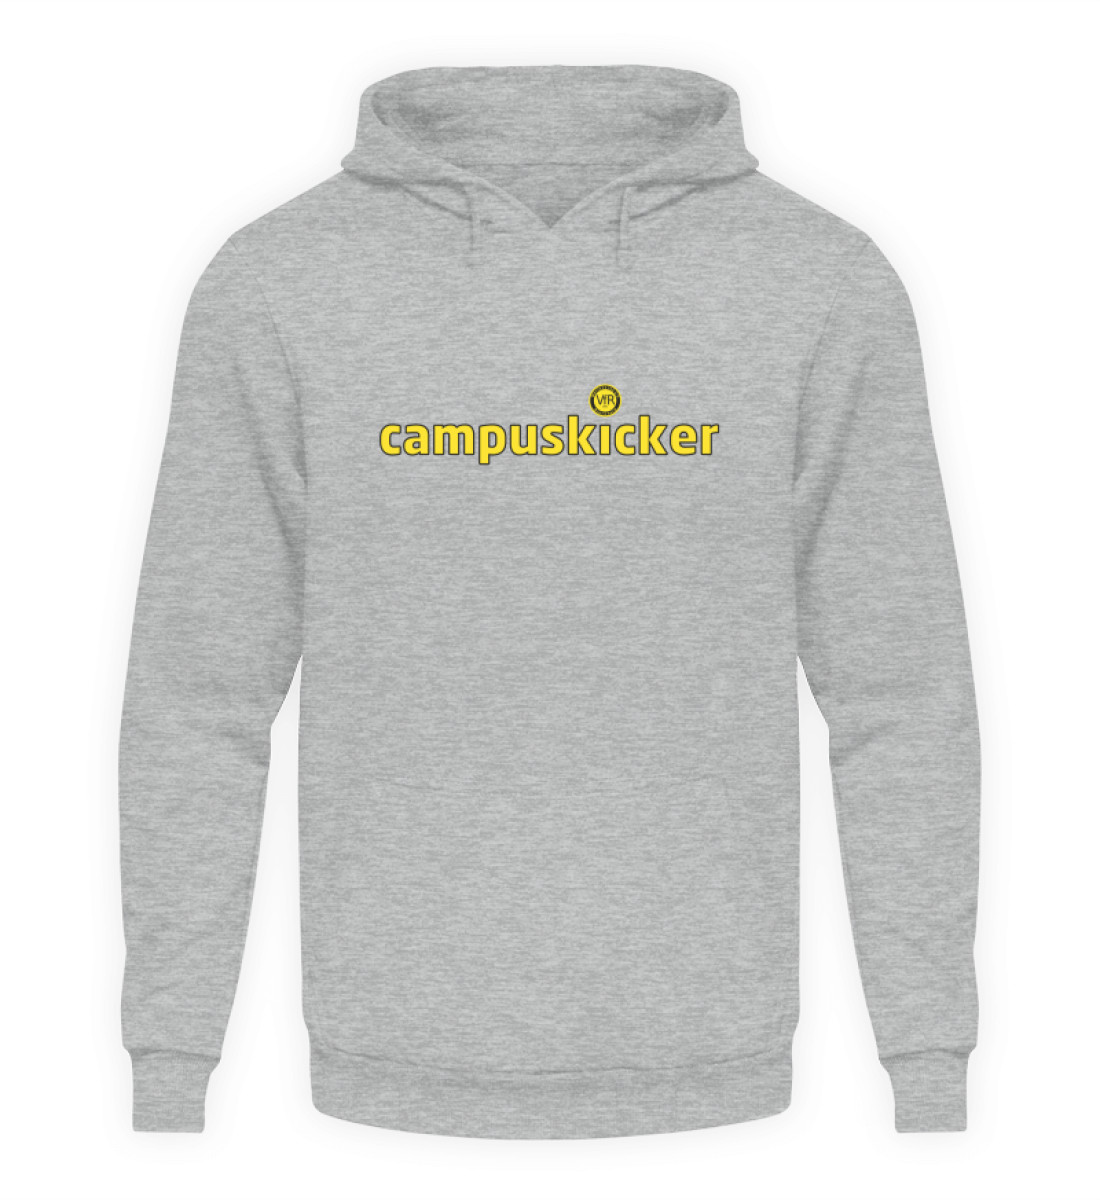 Campuskicker - Unisex Kapuzenpullover Hoodie-6807